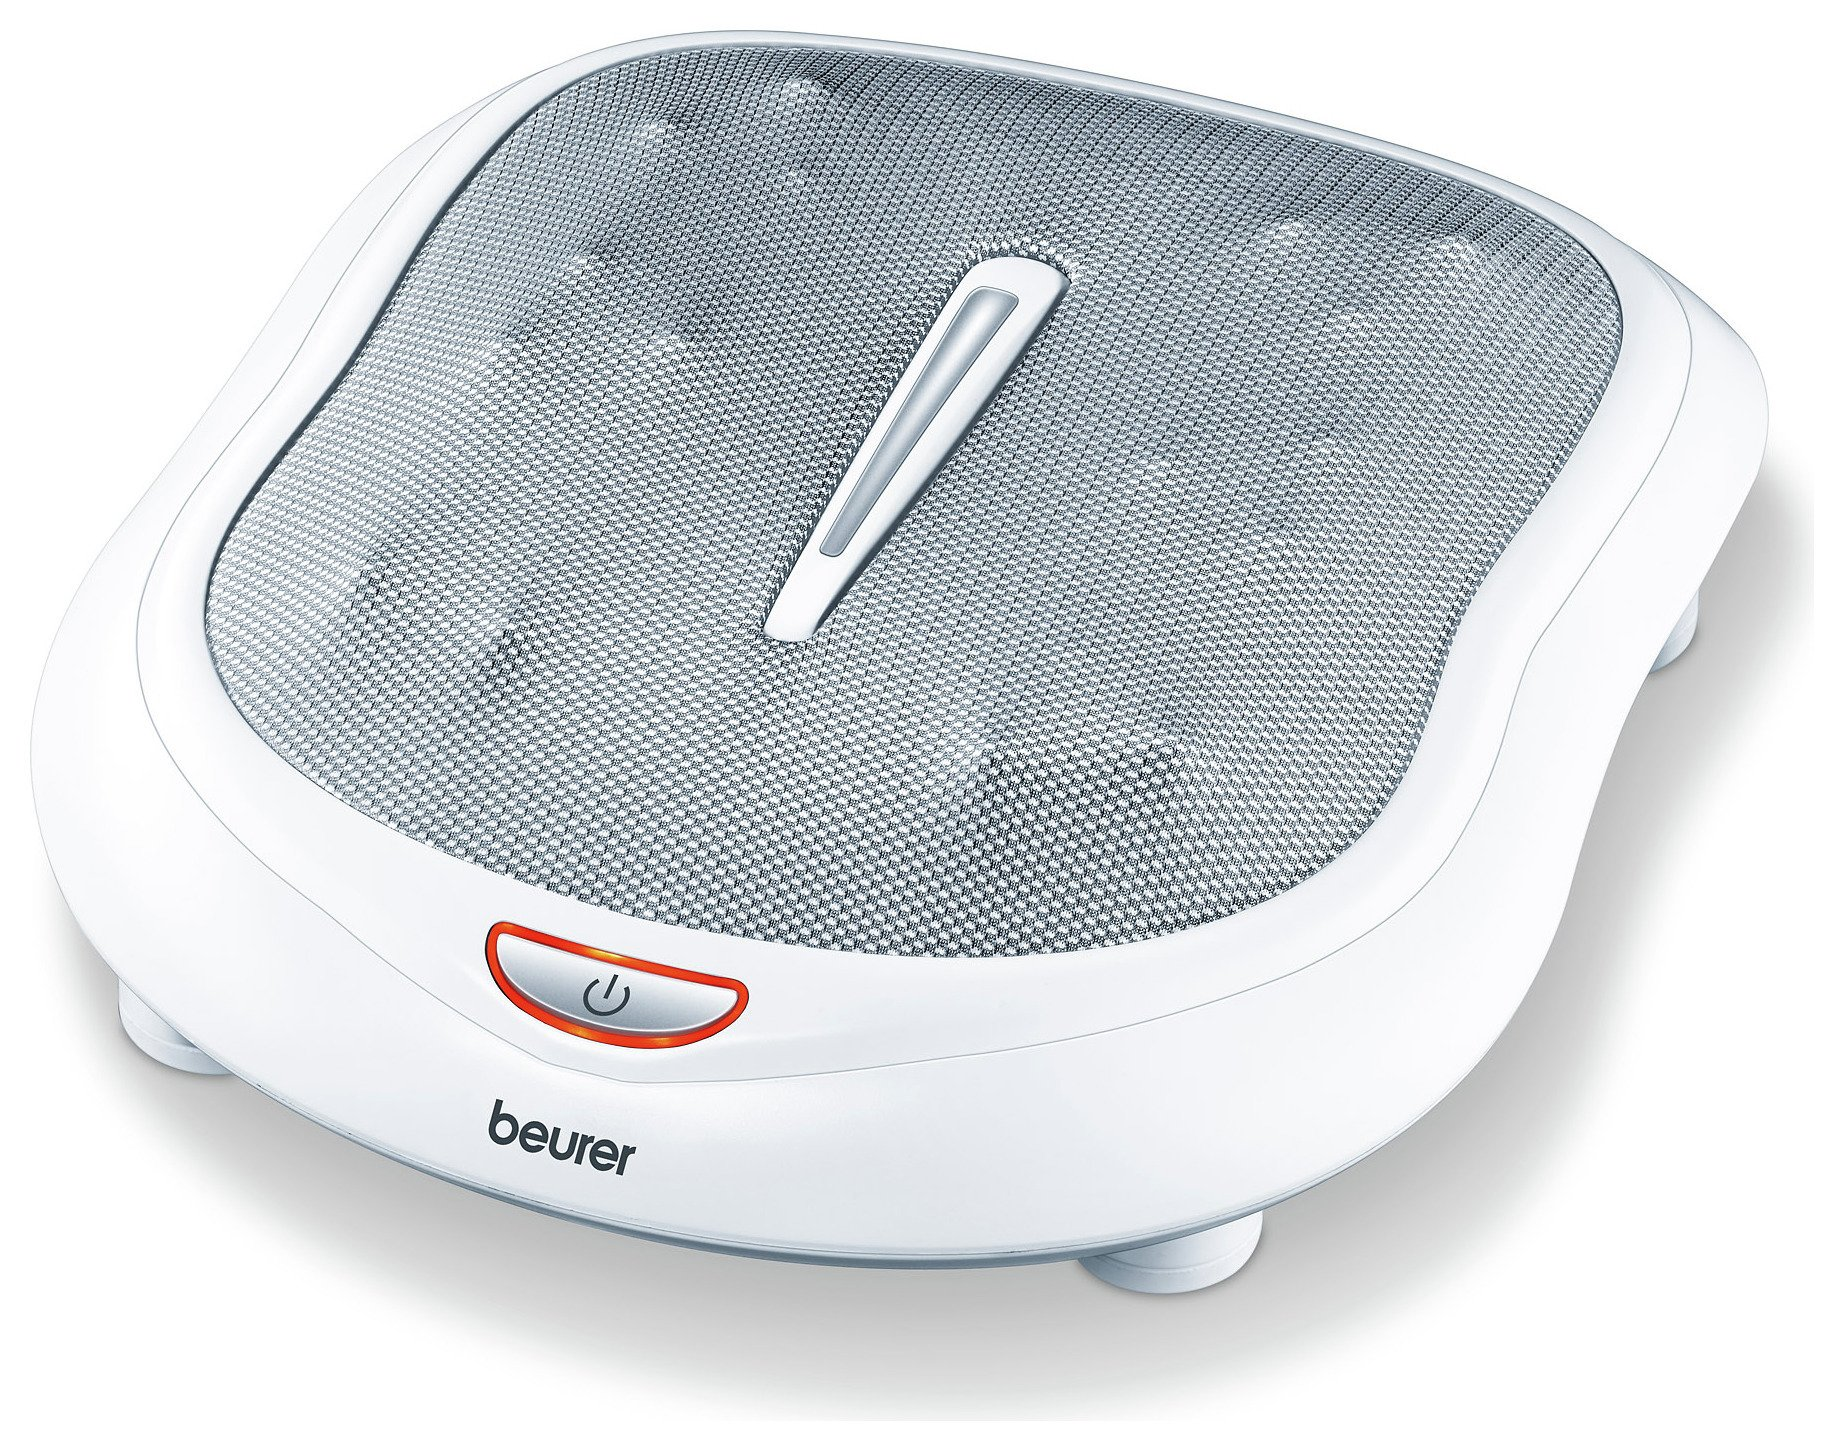 Beurer FM 60 Premium Shiatsu Foot Massager.